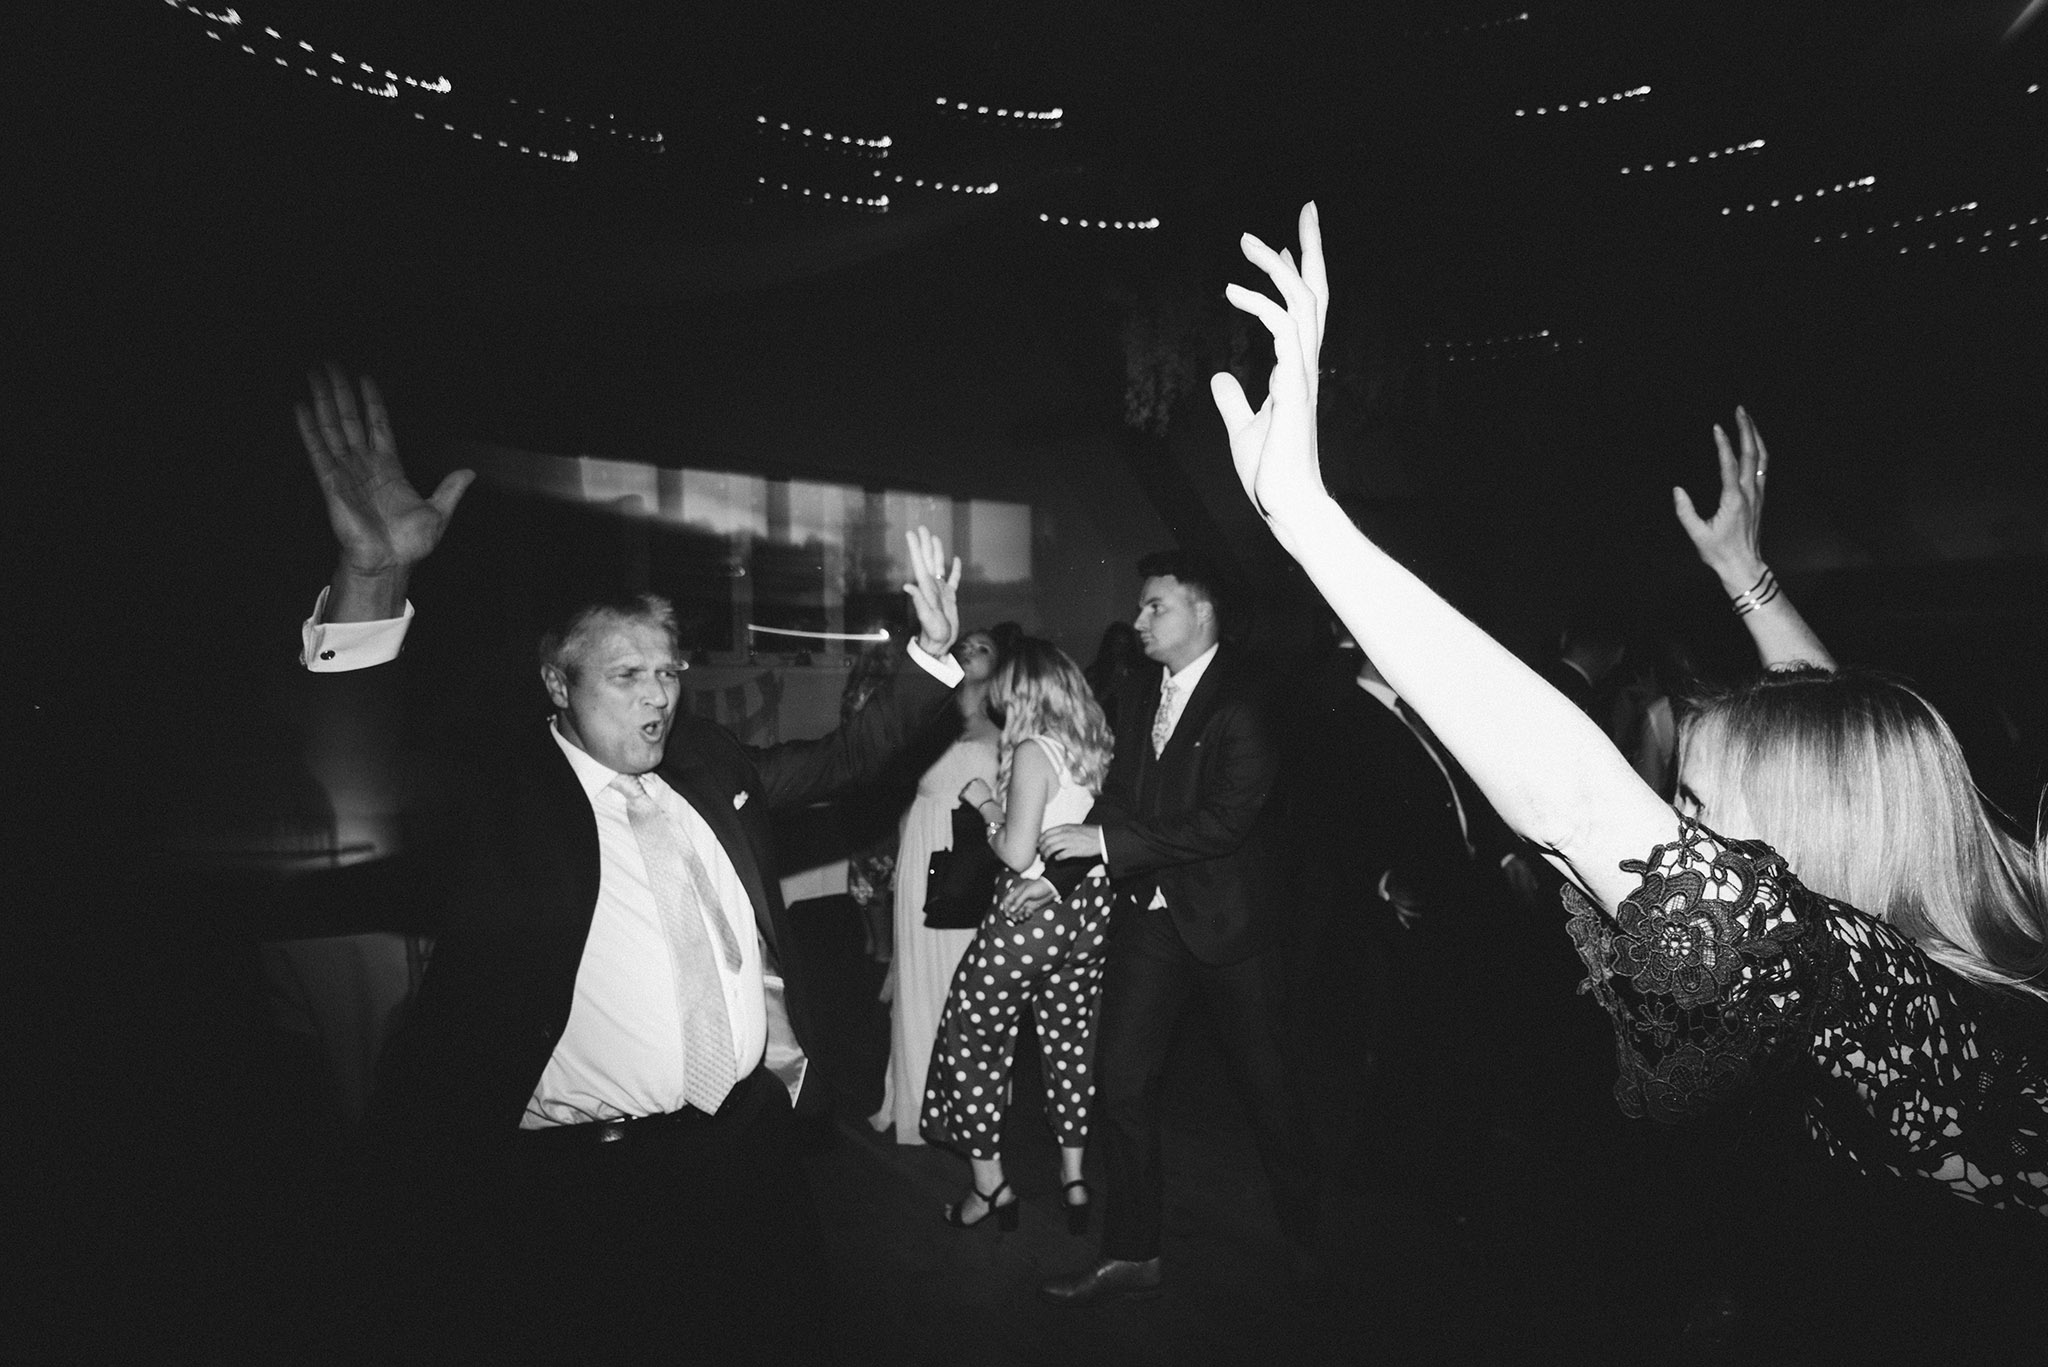 scott-stockwell-photography-wedding-51.jpg